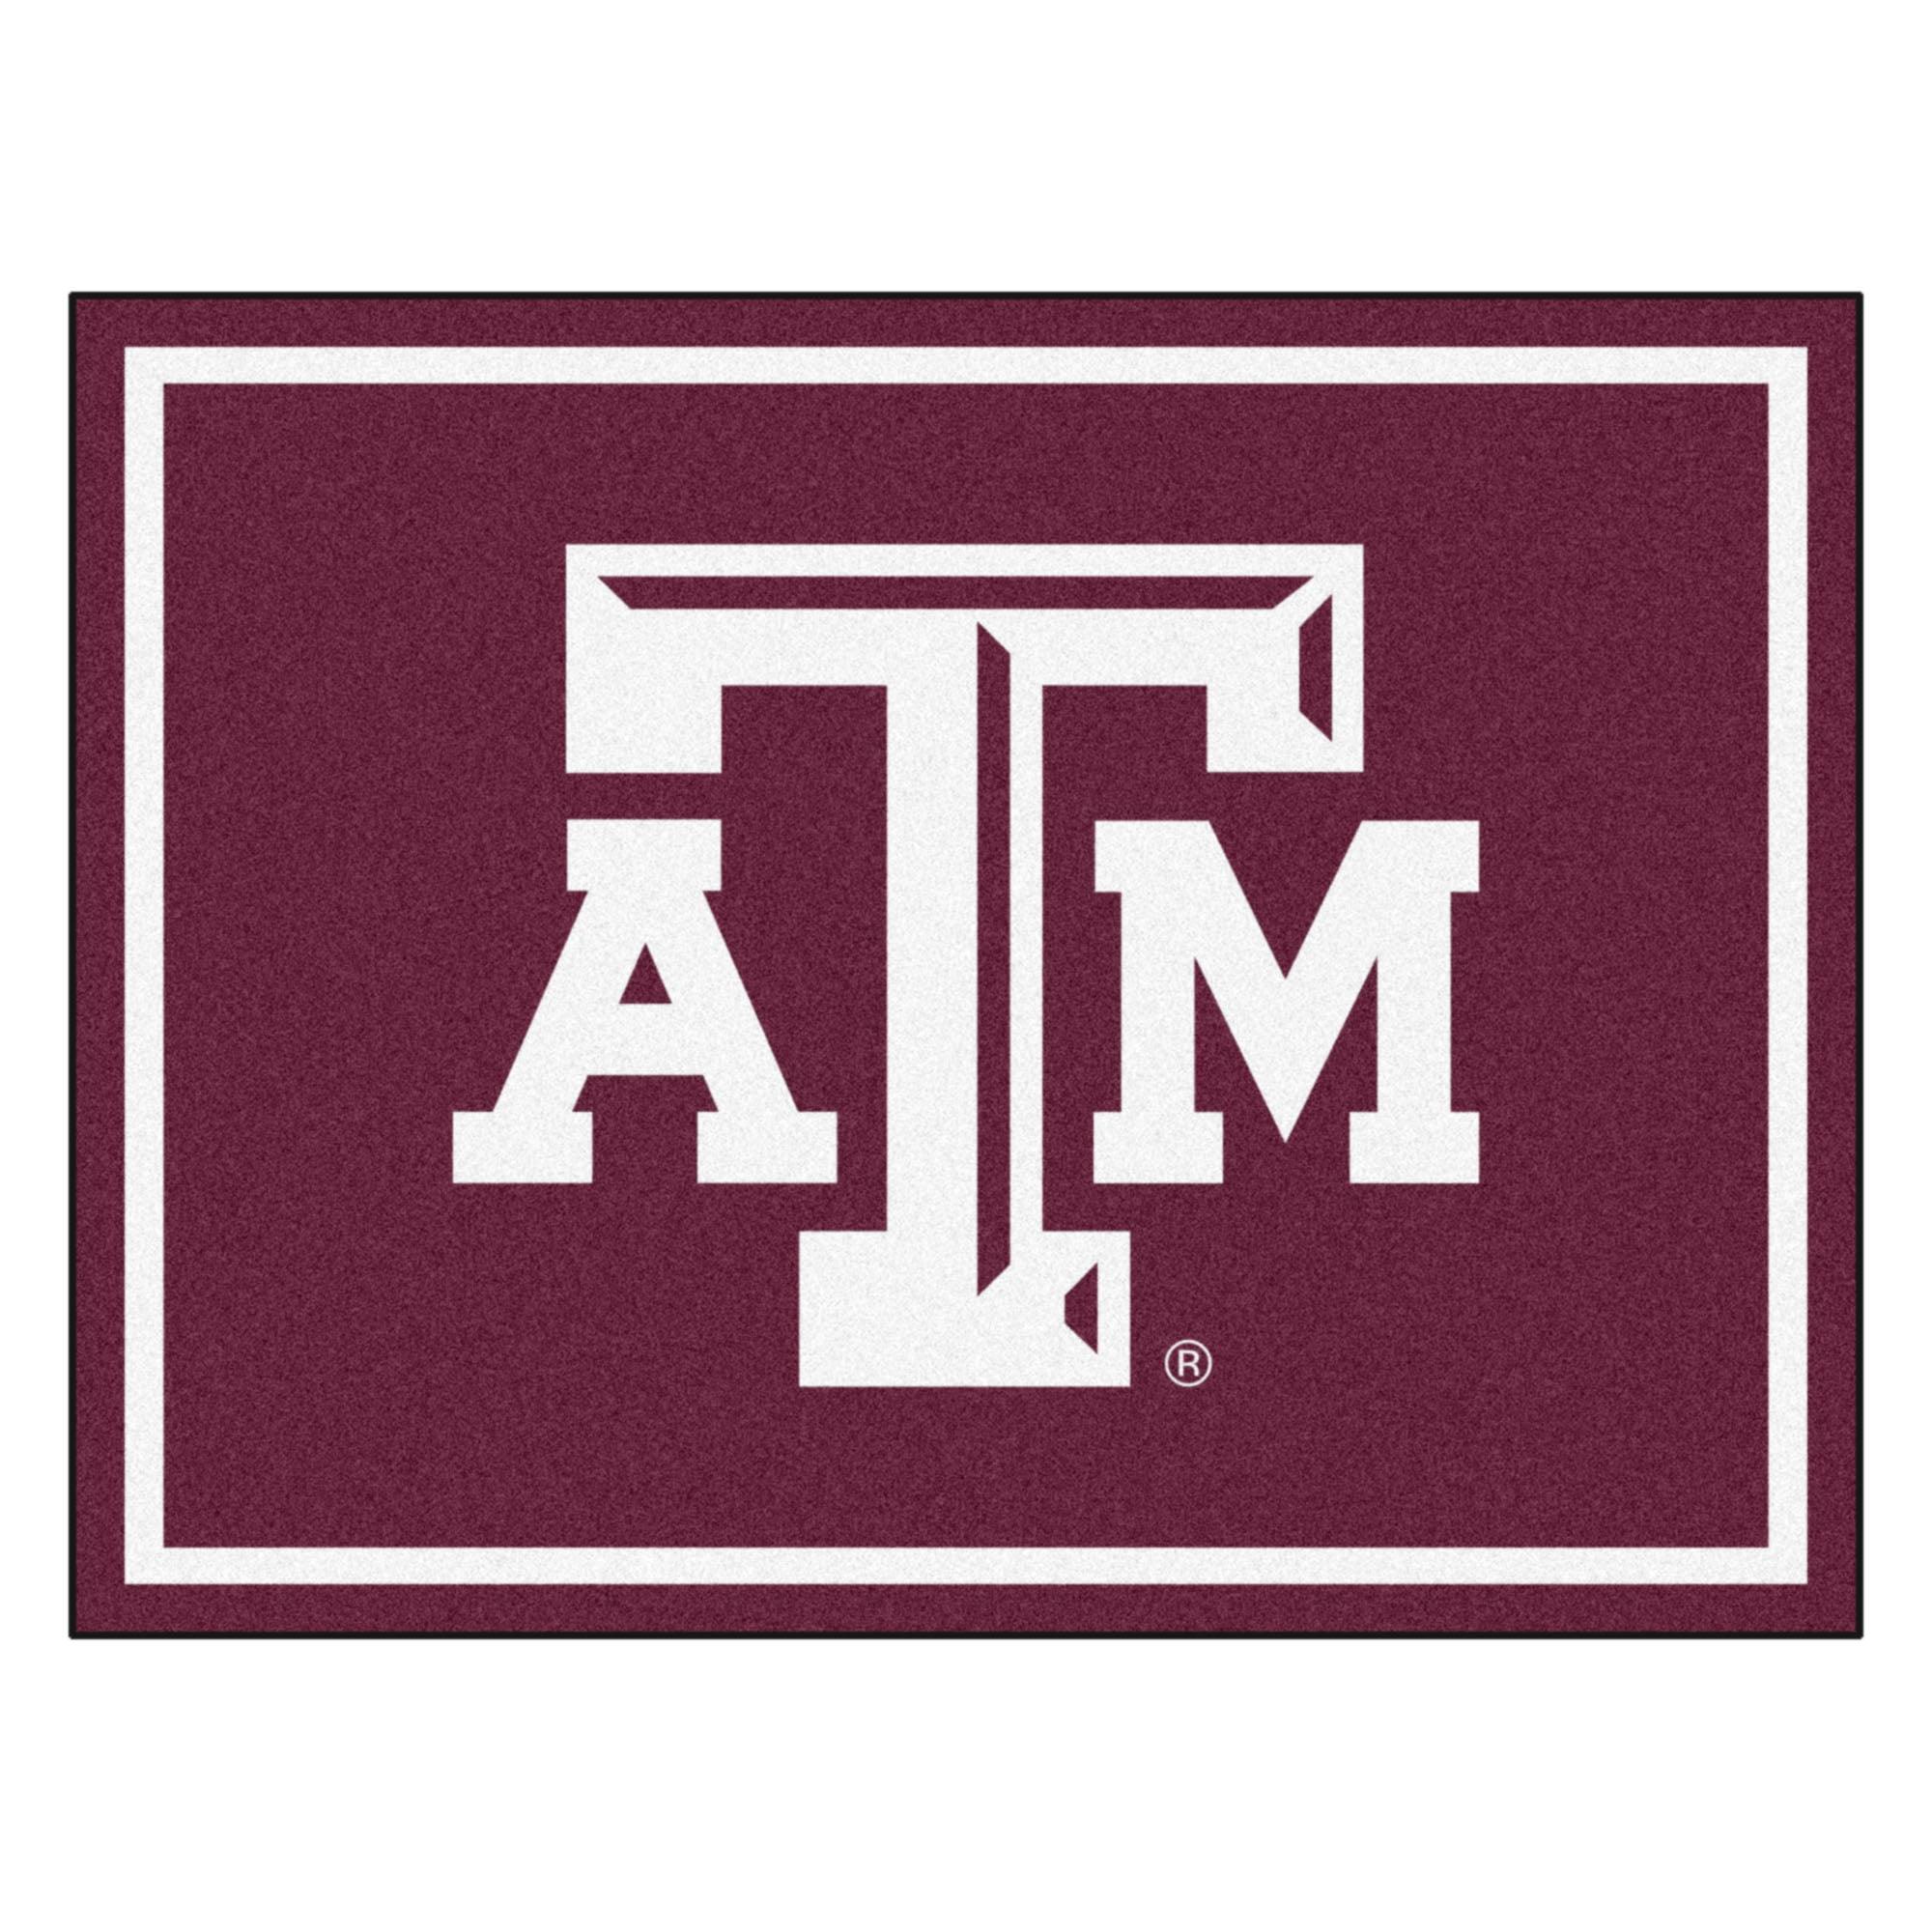 Texas A&M 8'x10' Rug